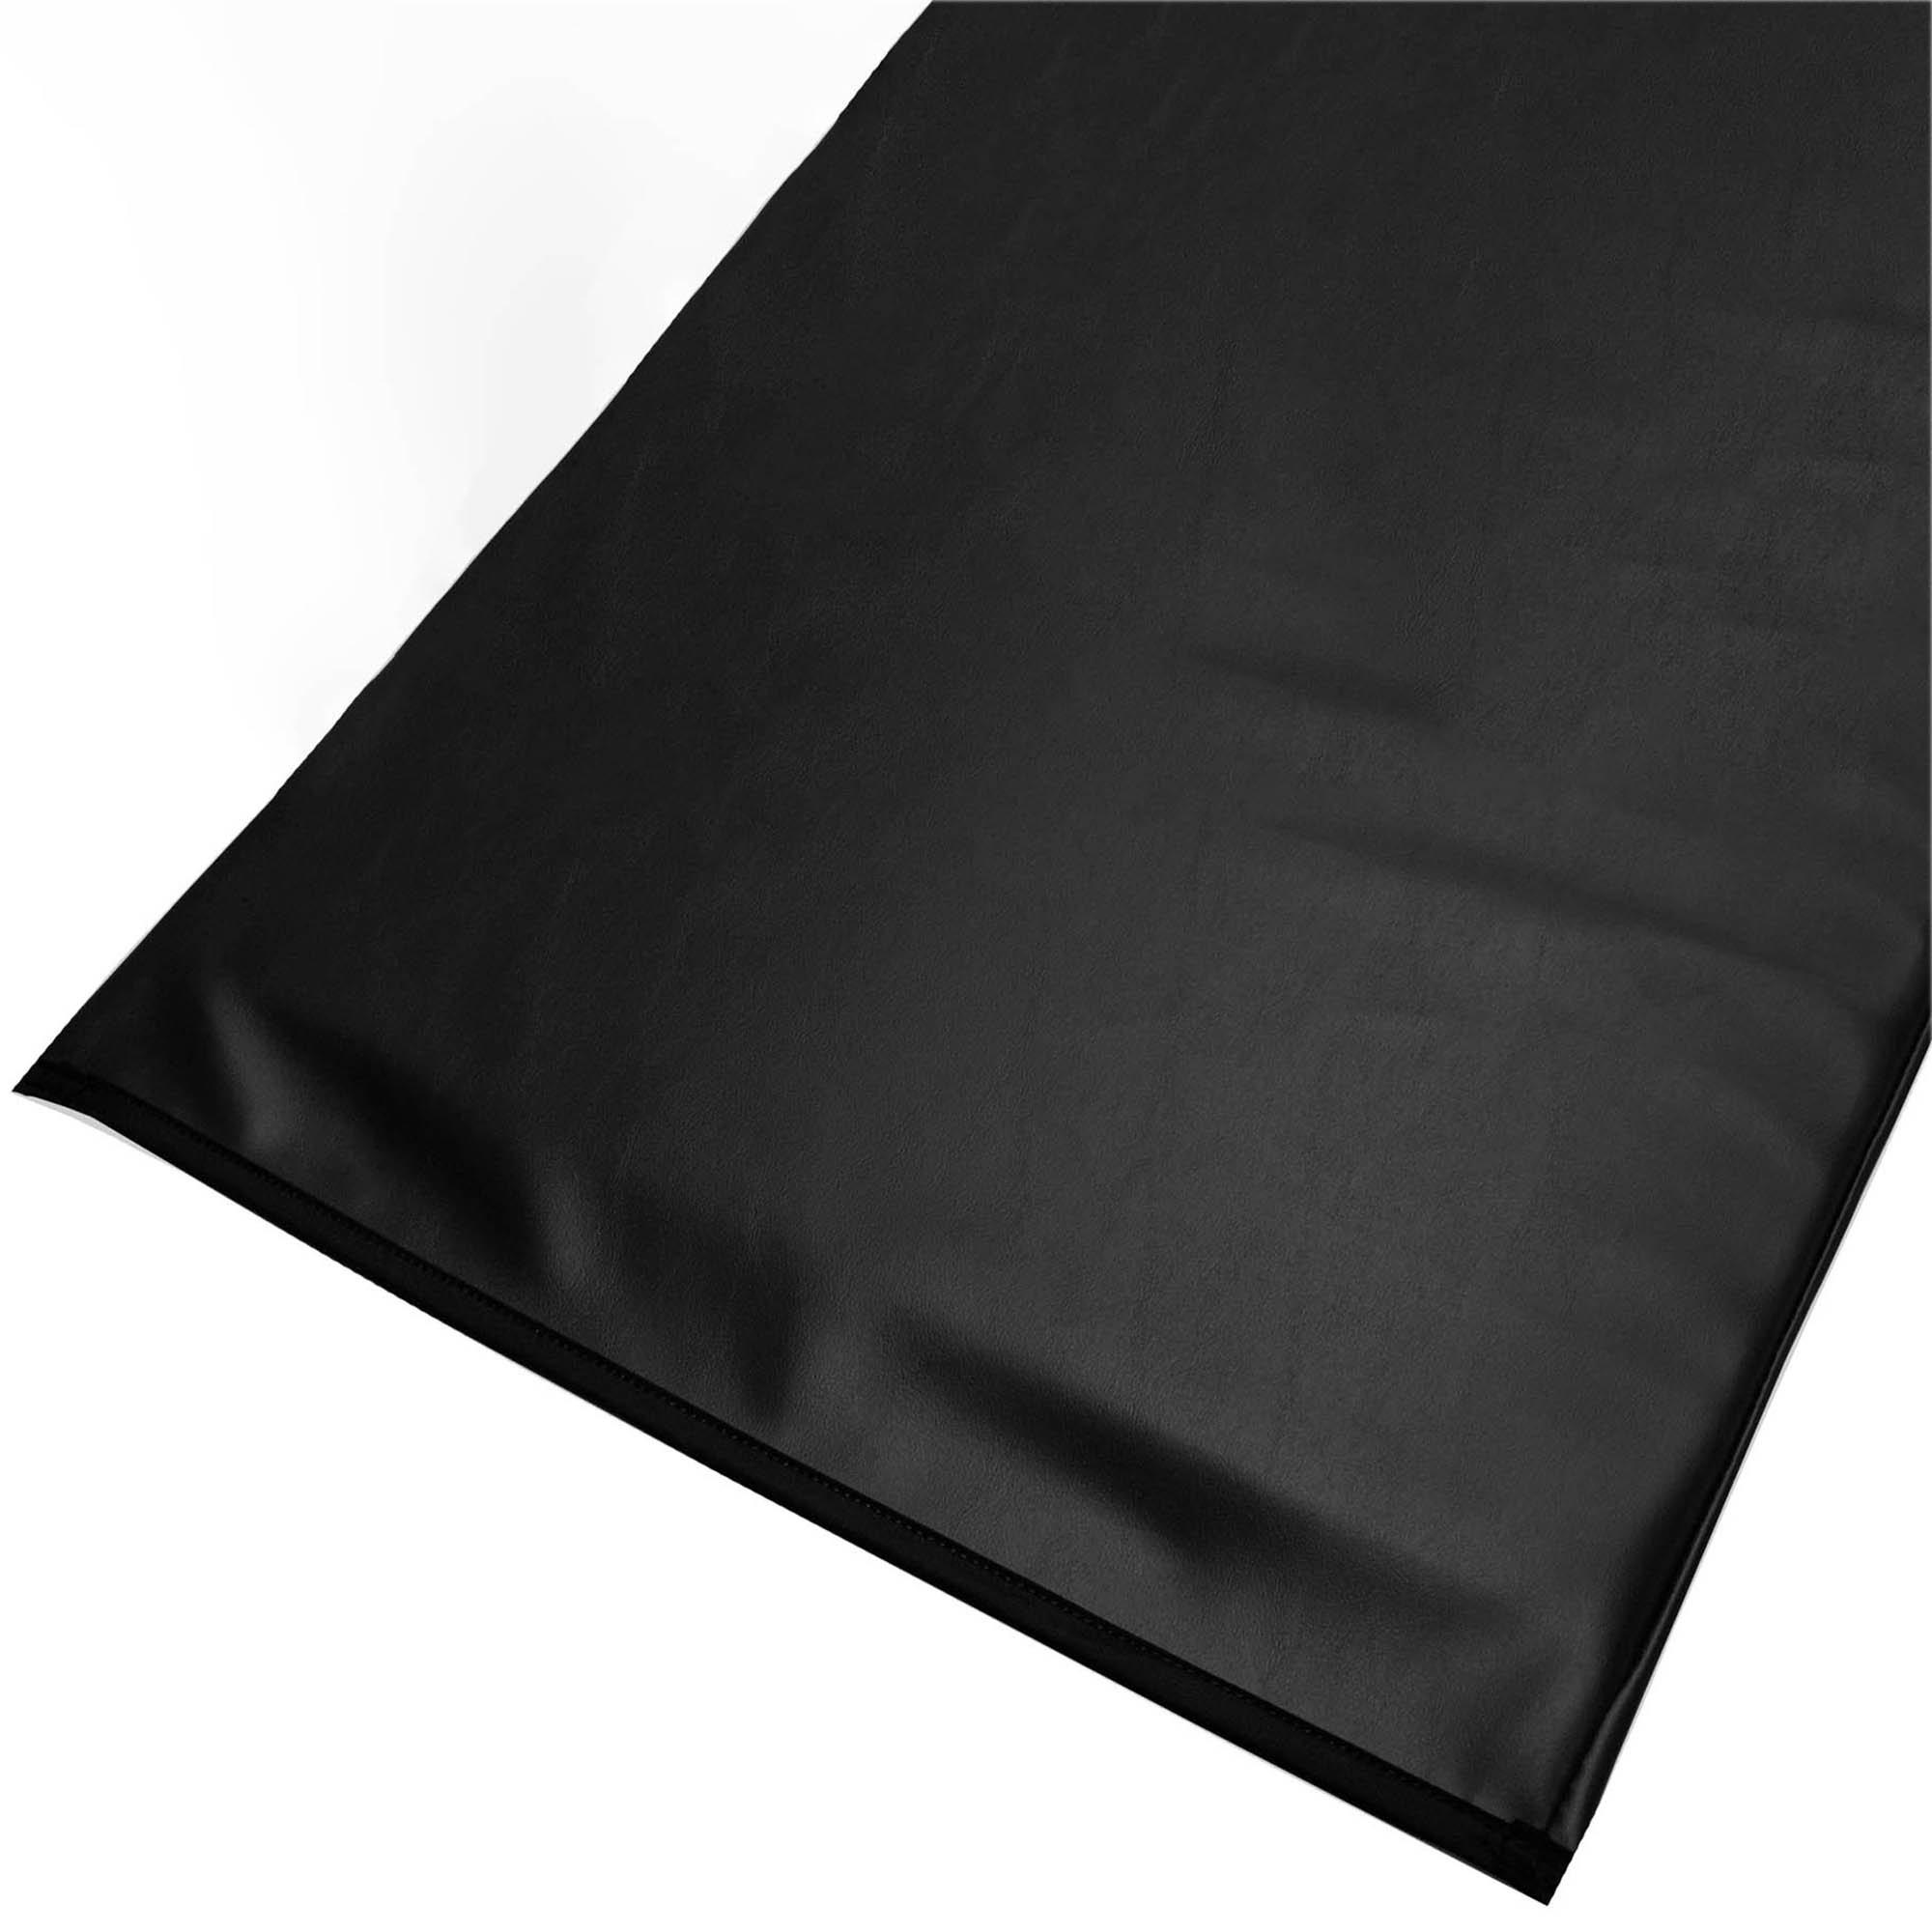 Standard Plus Radiolucent X-Ray Comfort Foam Table Pad - Black Vinyl, No Grommets 80